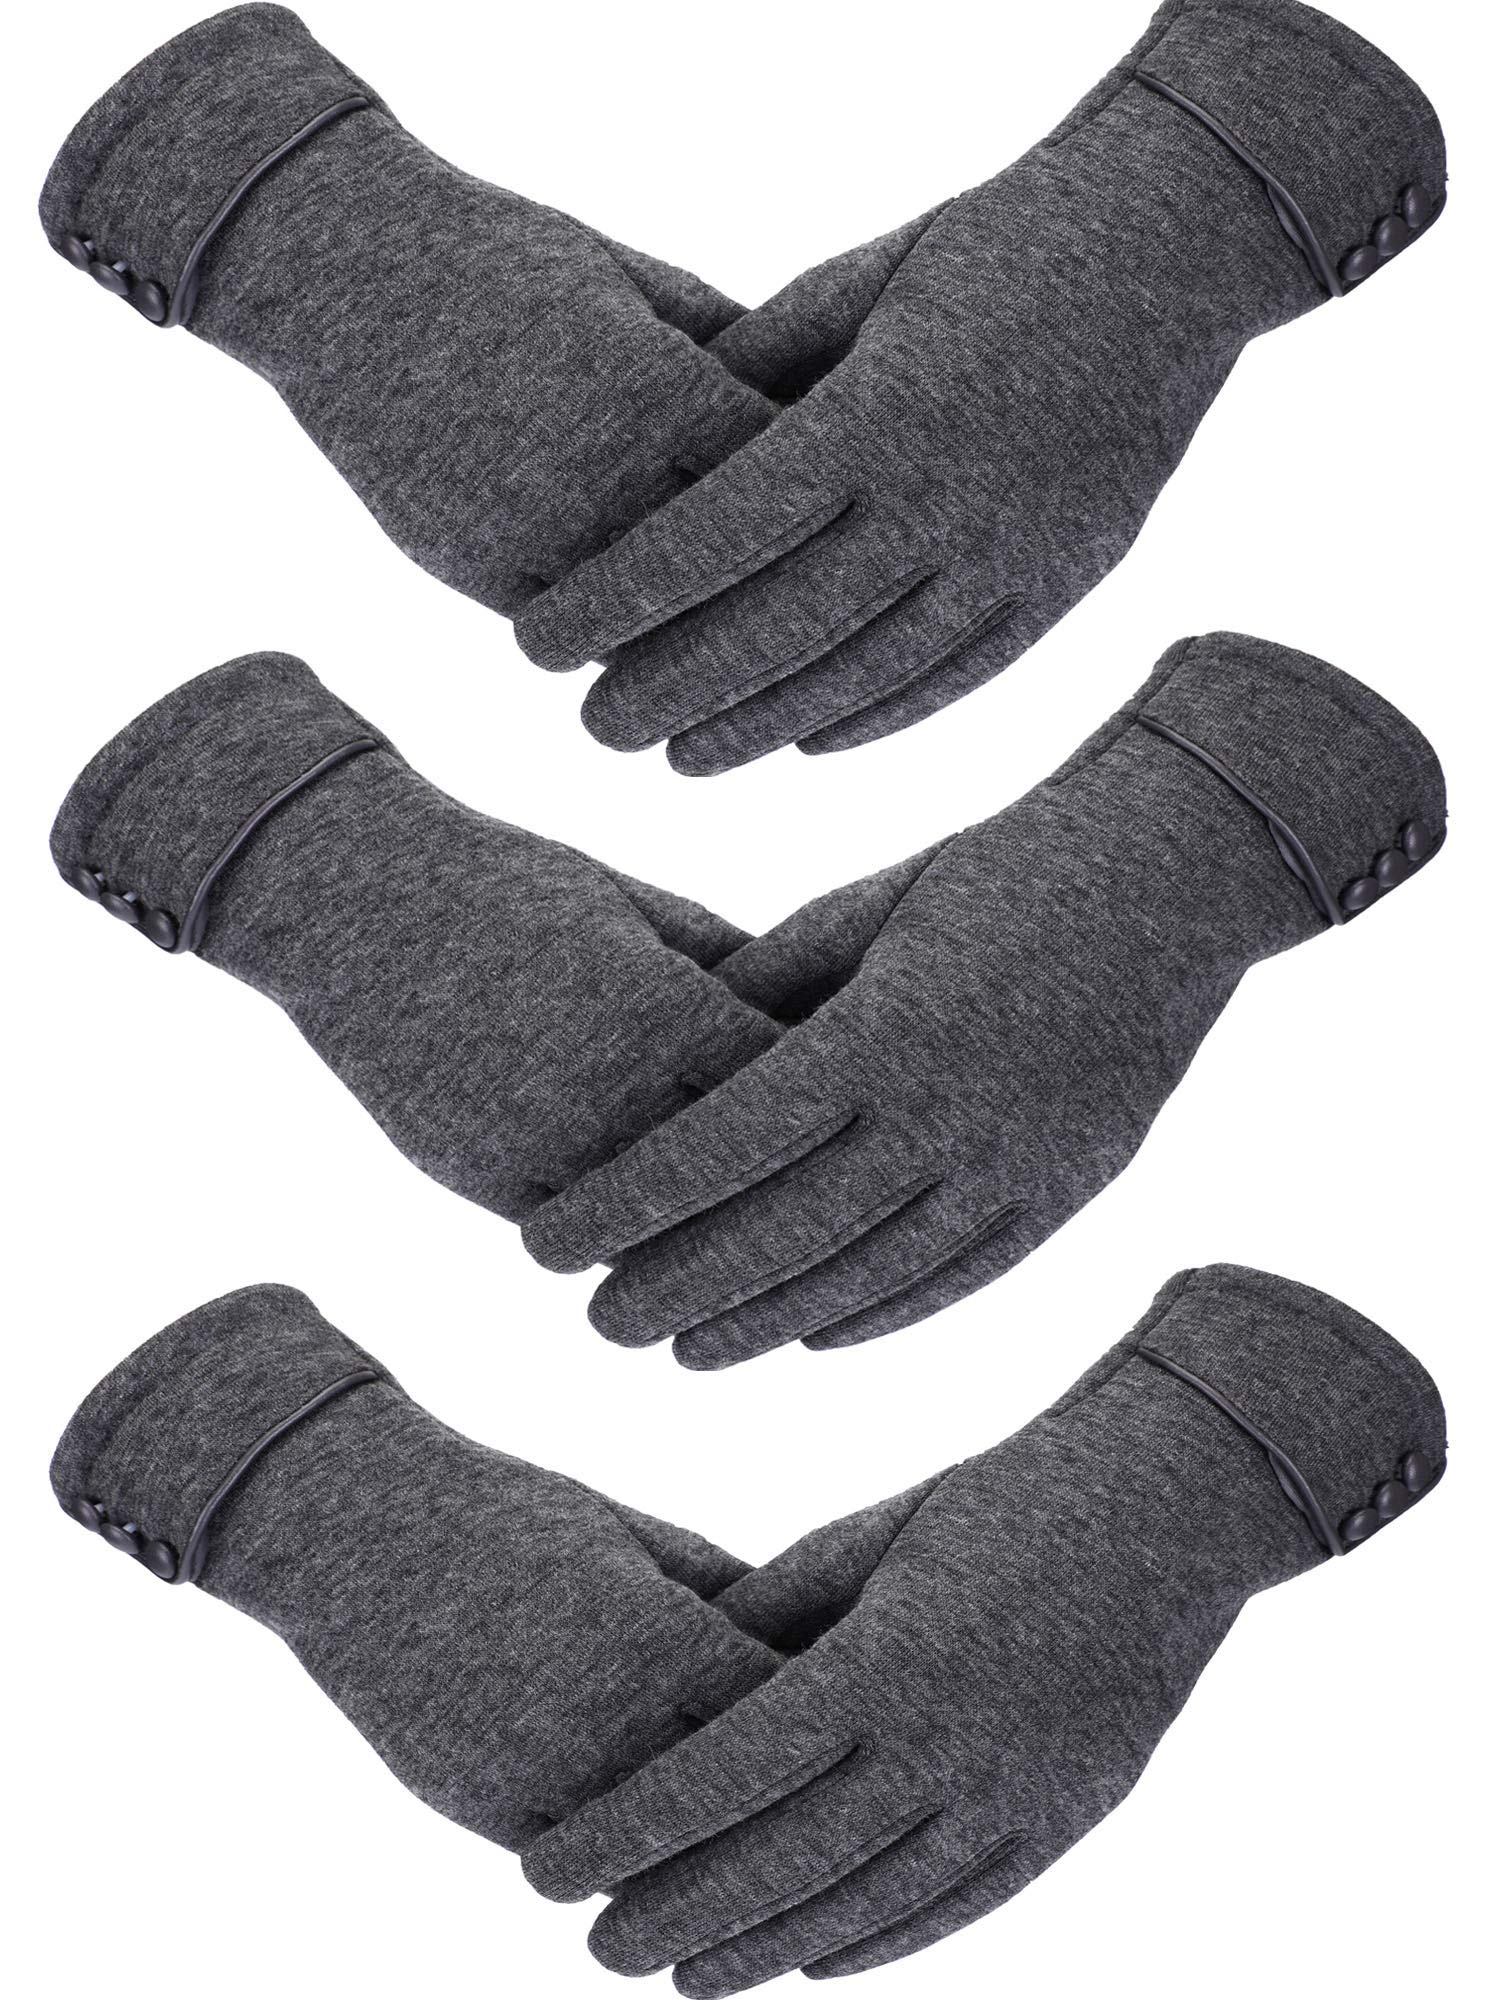 Patelai 3 Pairs Women Winter Gloves Warm Touchscreen Gloves Windproof Plush Gloves for Women Girls Winter Using (Gray)